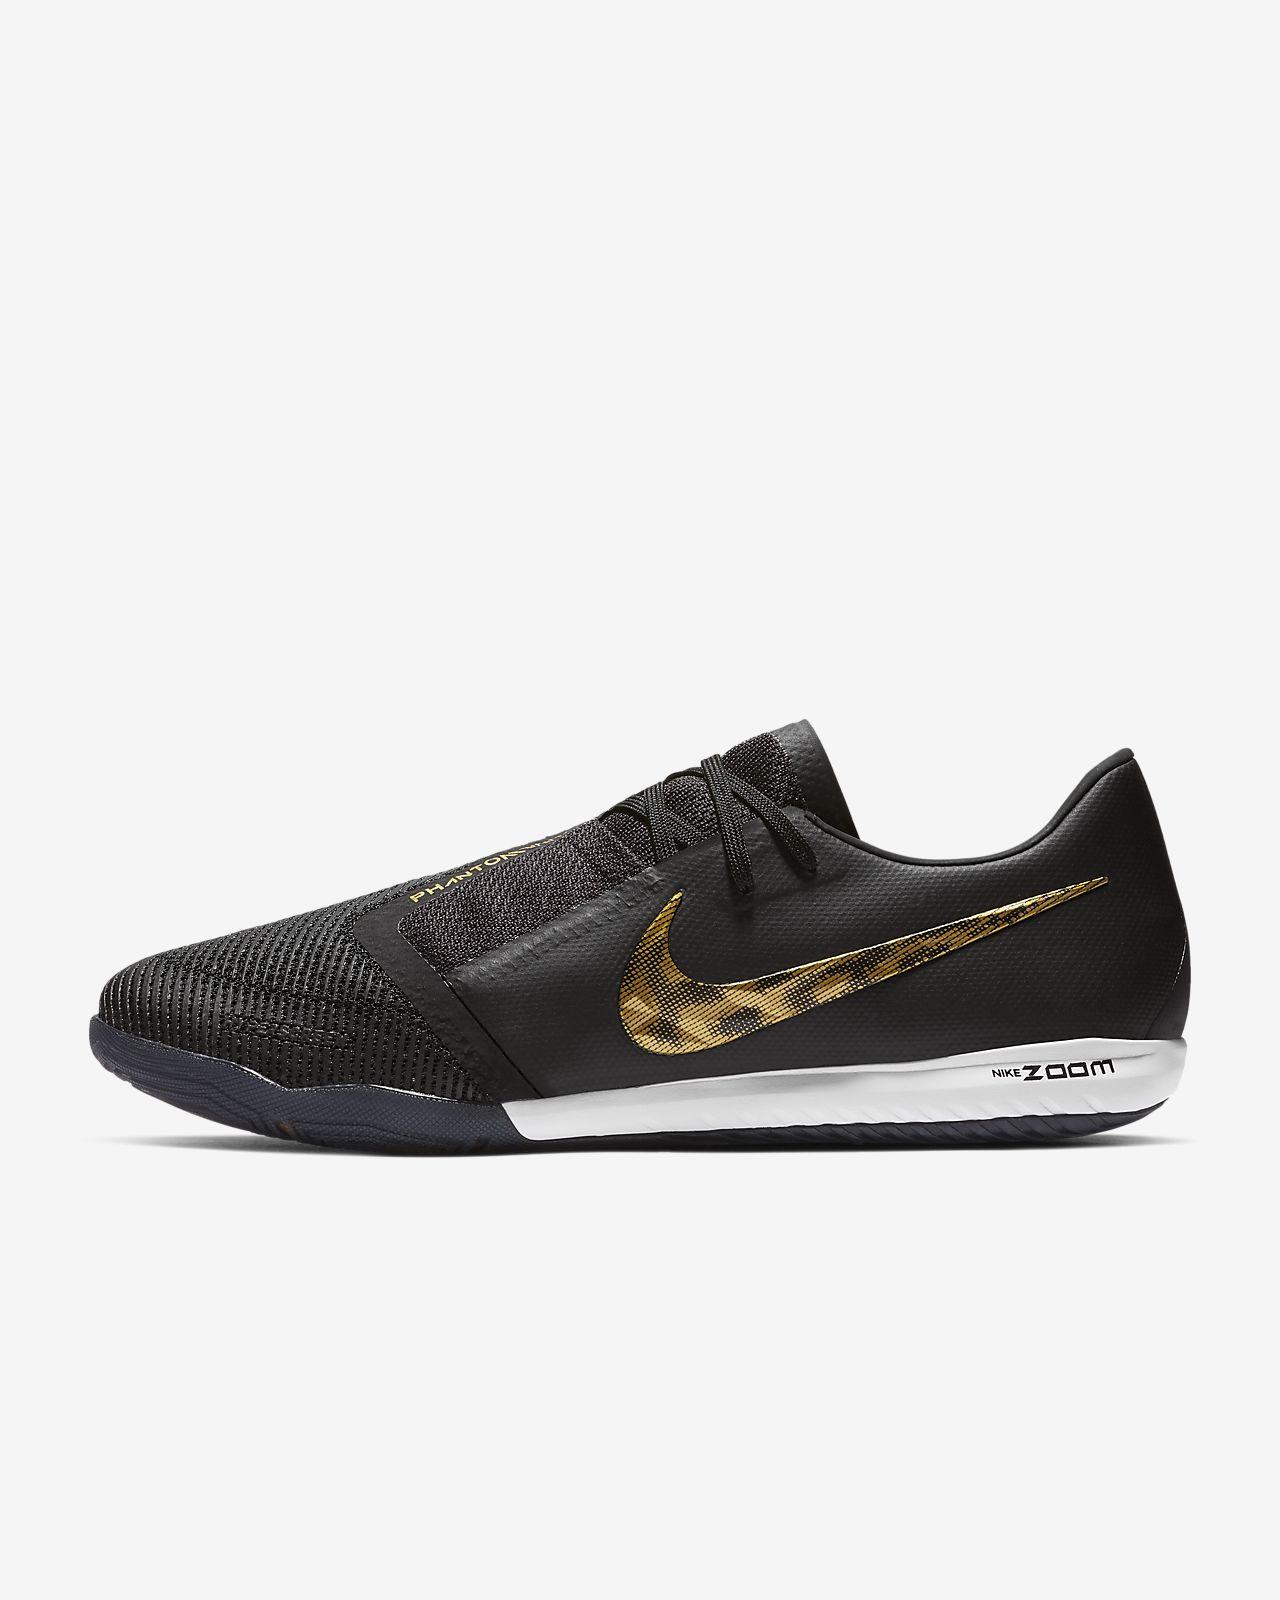 Nike Zoom Phantom Venom Pro IC Indoor/Court Football Shoe